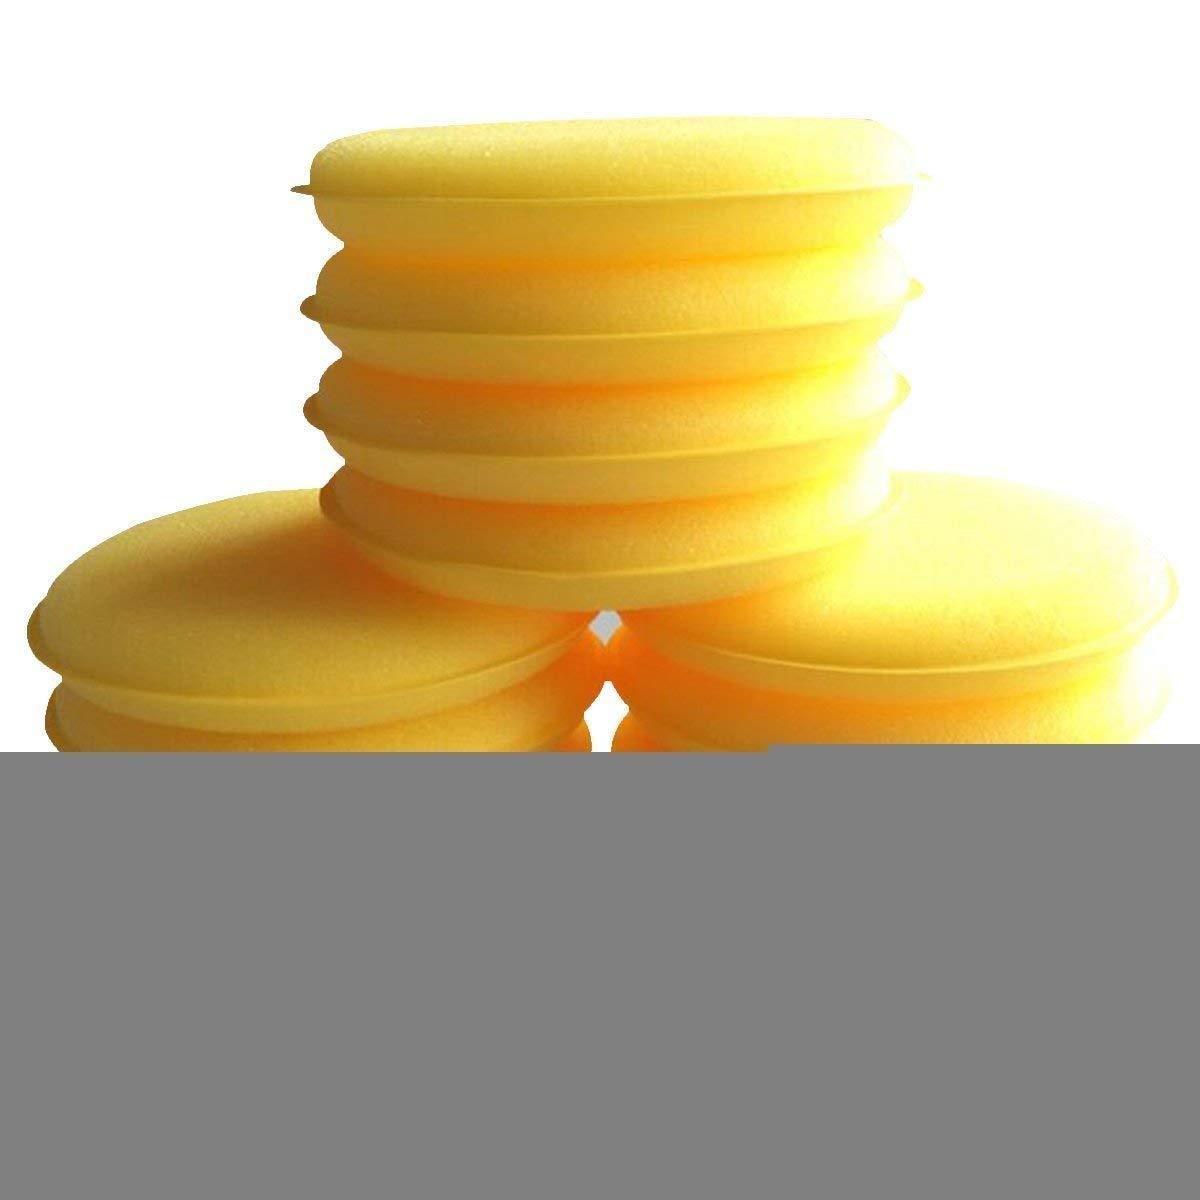 2Pcs Waxing Polish Wax Foam Sponge Applicator Pads Fit for Clean Car Vehicle Auto Glass 3.75 Inches Across,100Mm6Mm